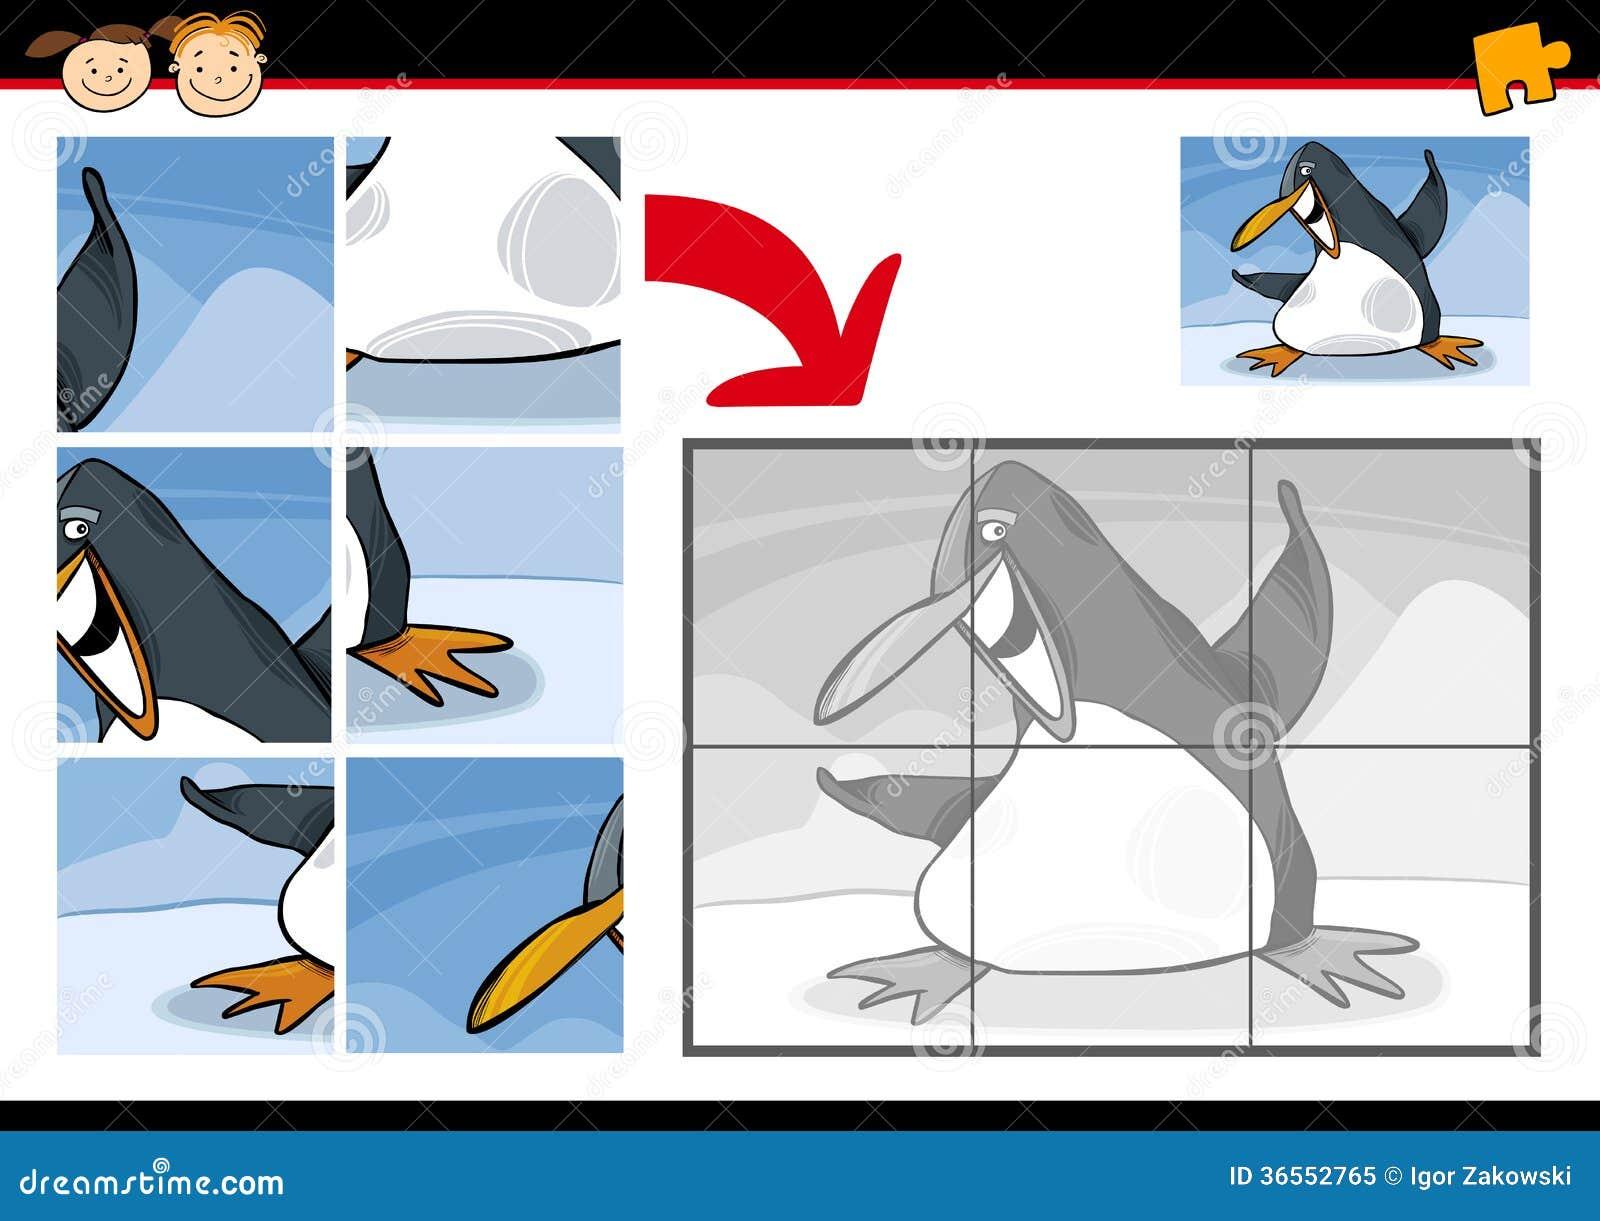 Cartoon Penguin Jigsaw Puzzle Game Royalty Free Stock Photo - Image ...